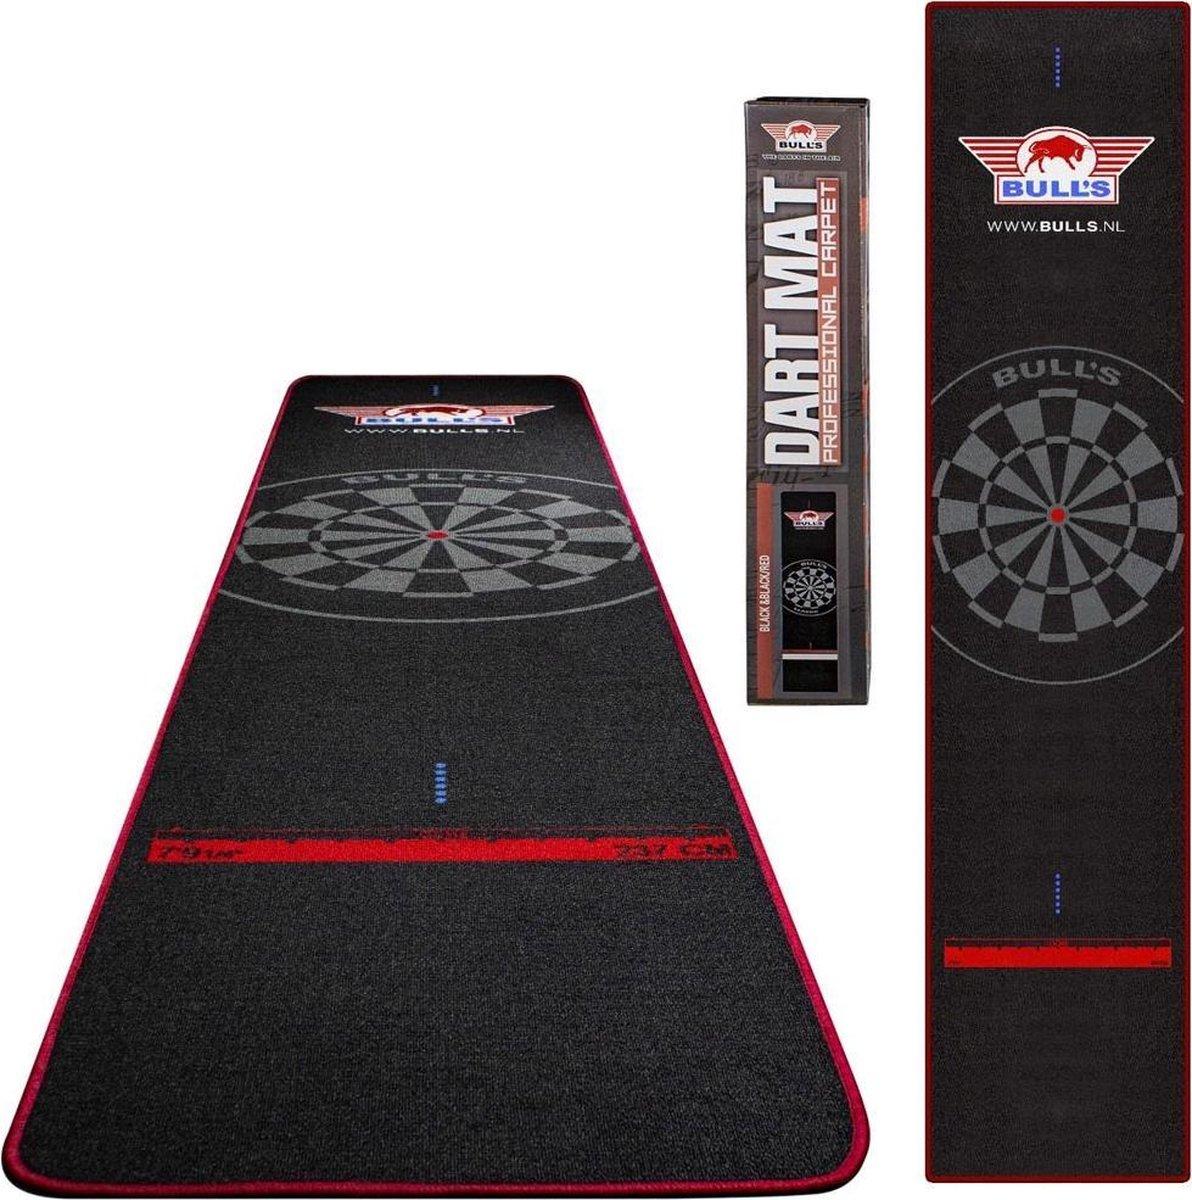 Bulls Carpet Oche Dartmat 300 x 65cm black-red.